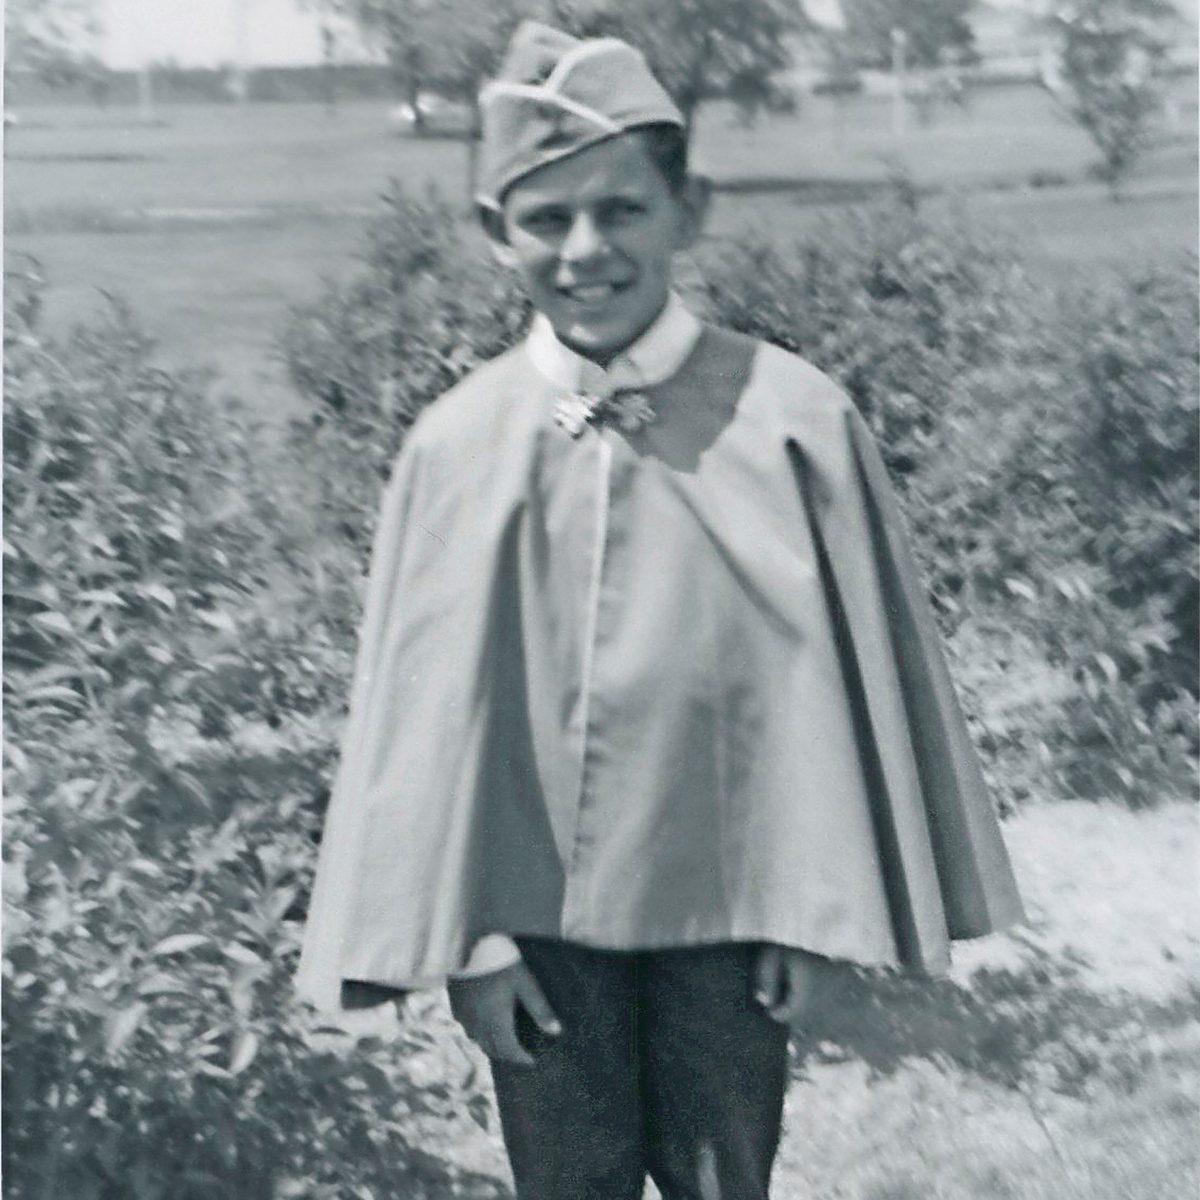 child dressed in Halloween costume /REM Magazine/2014/10_11/20_GrowingUp_REMON14_R3_032-034/Links